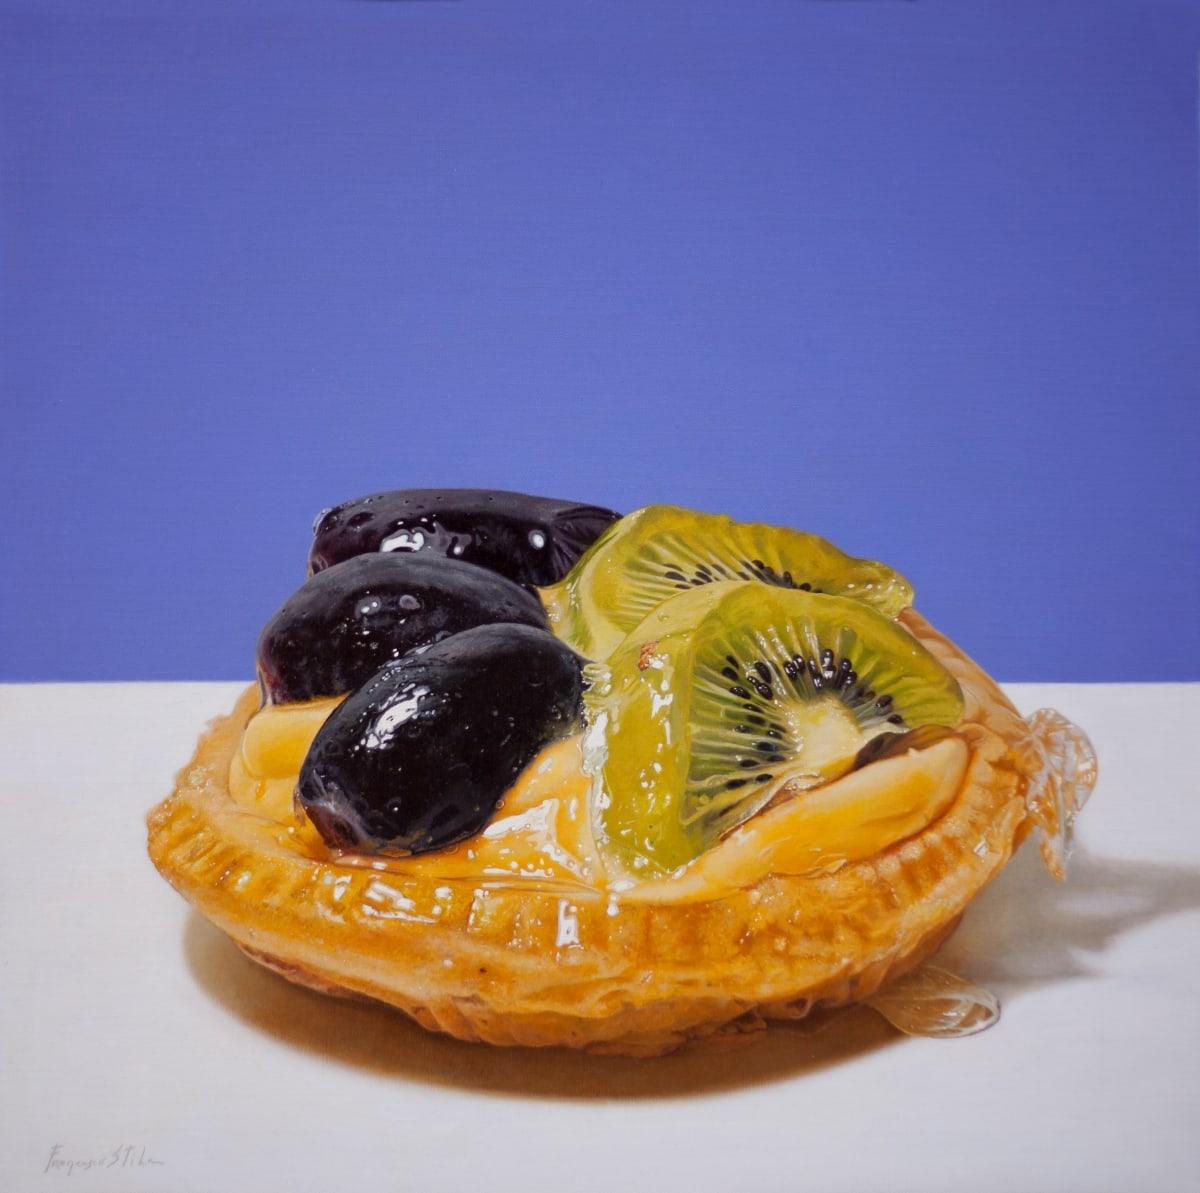 Francesco Stile Kicca Oil on canvas 60 x 60 cm